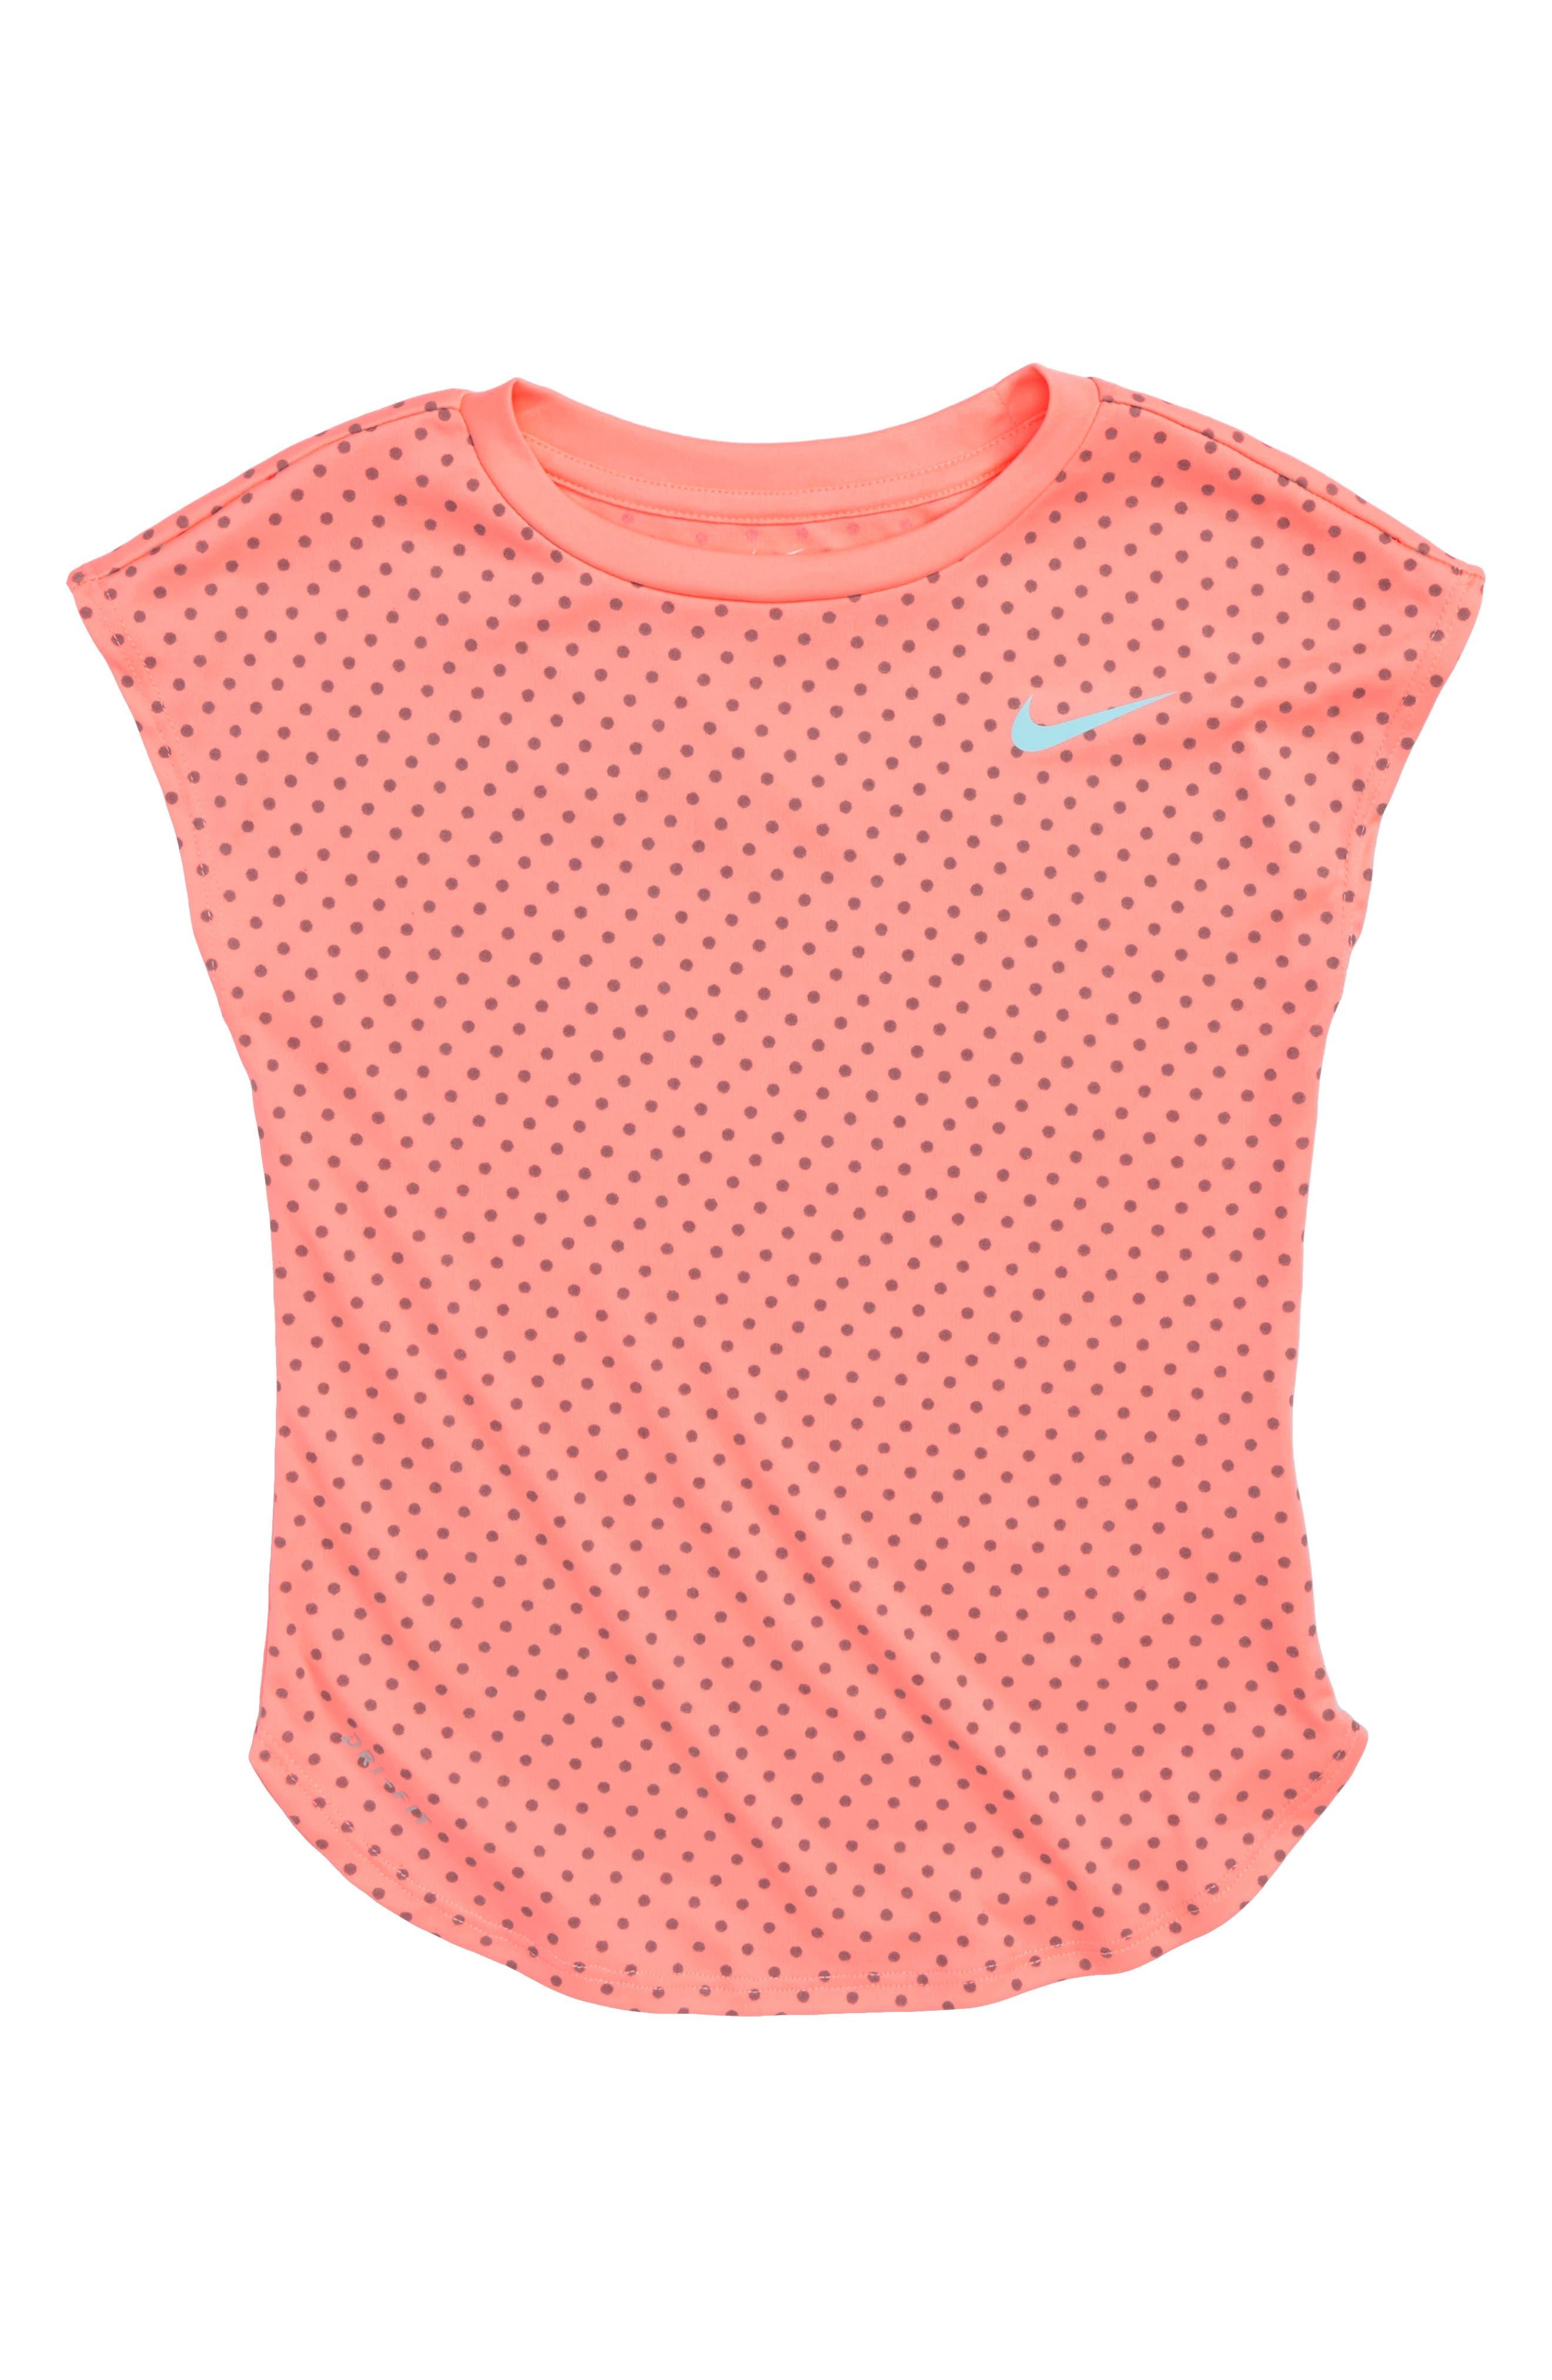 Dry Reflective Dot Tee,                         Main,                         color, Light Atomic Pink